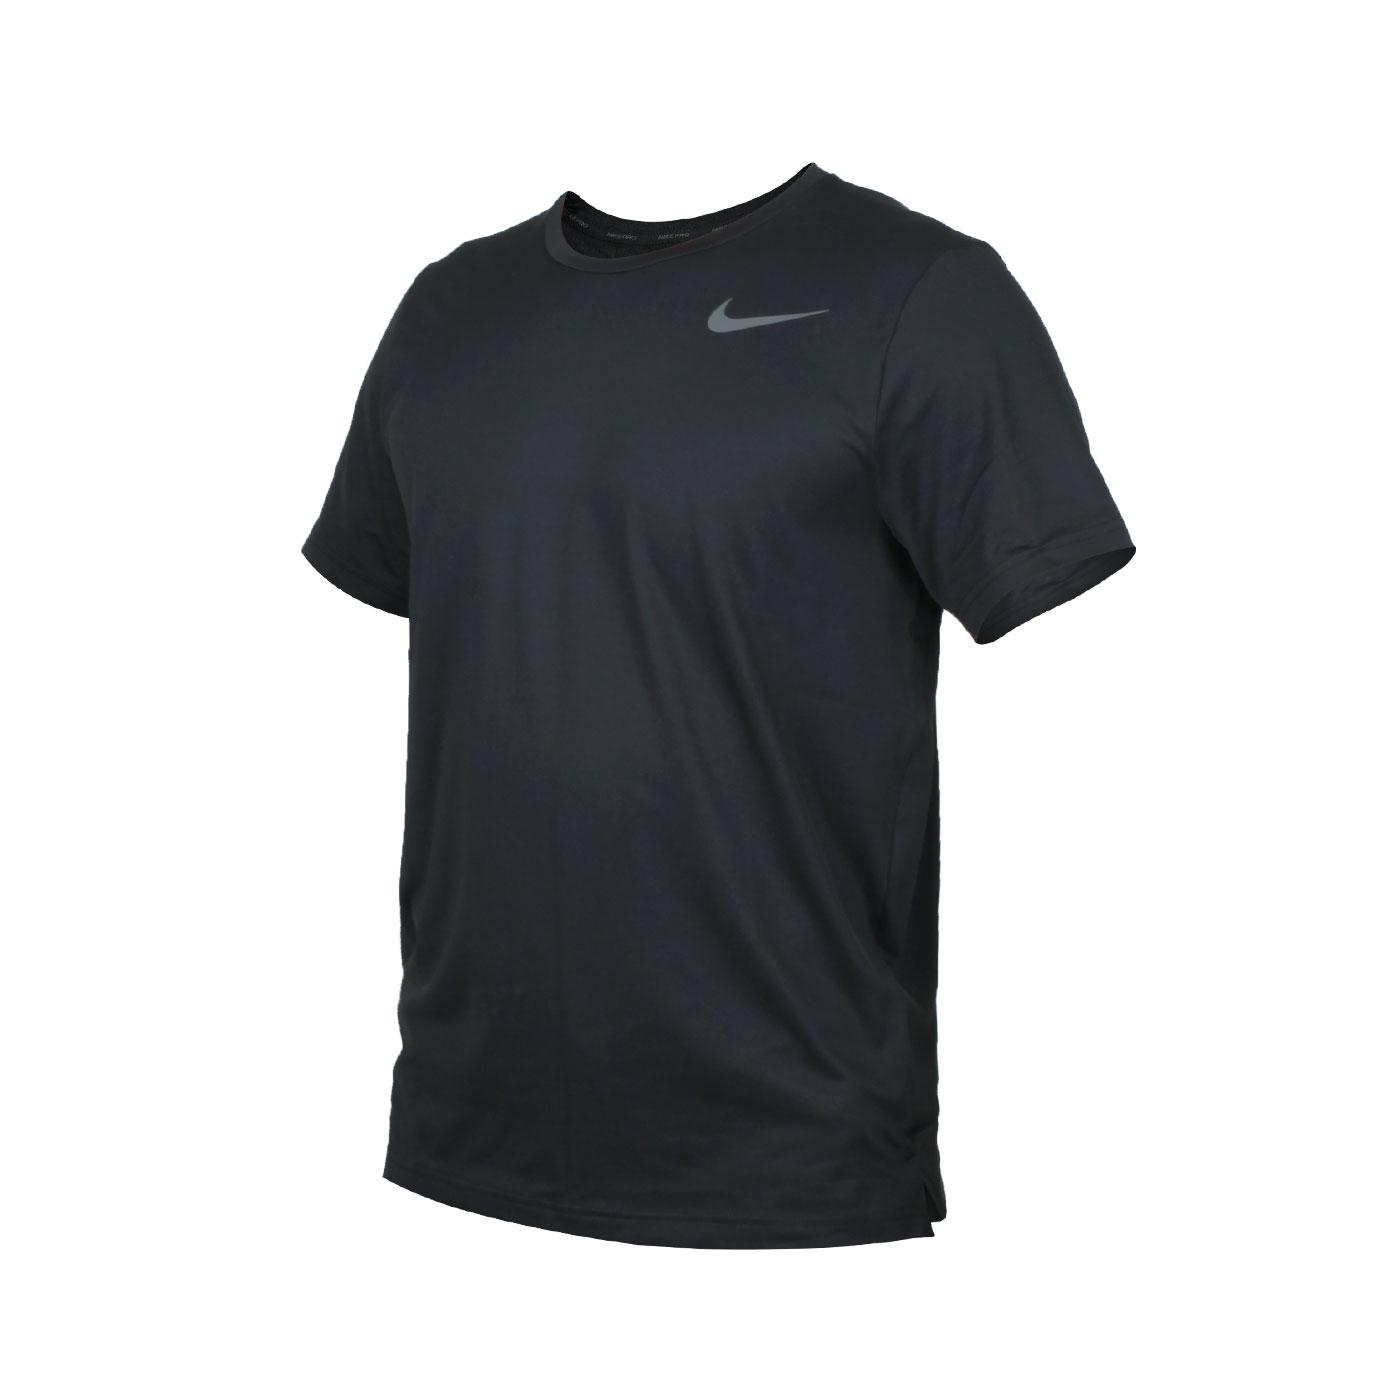 NIKE 男款訓練排汗短袖T恤 CJ4612-010 - 黑灰